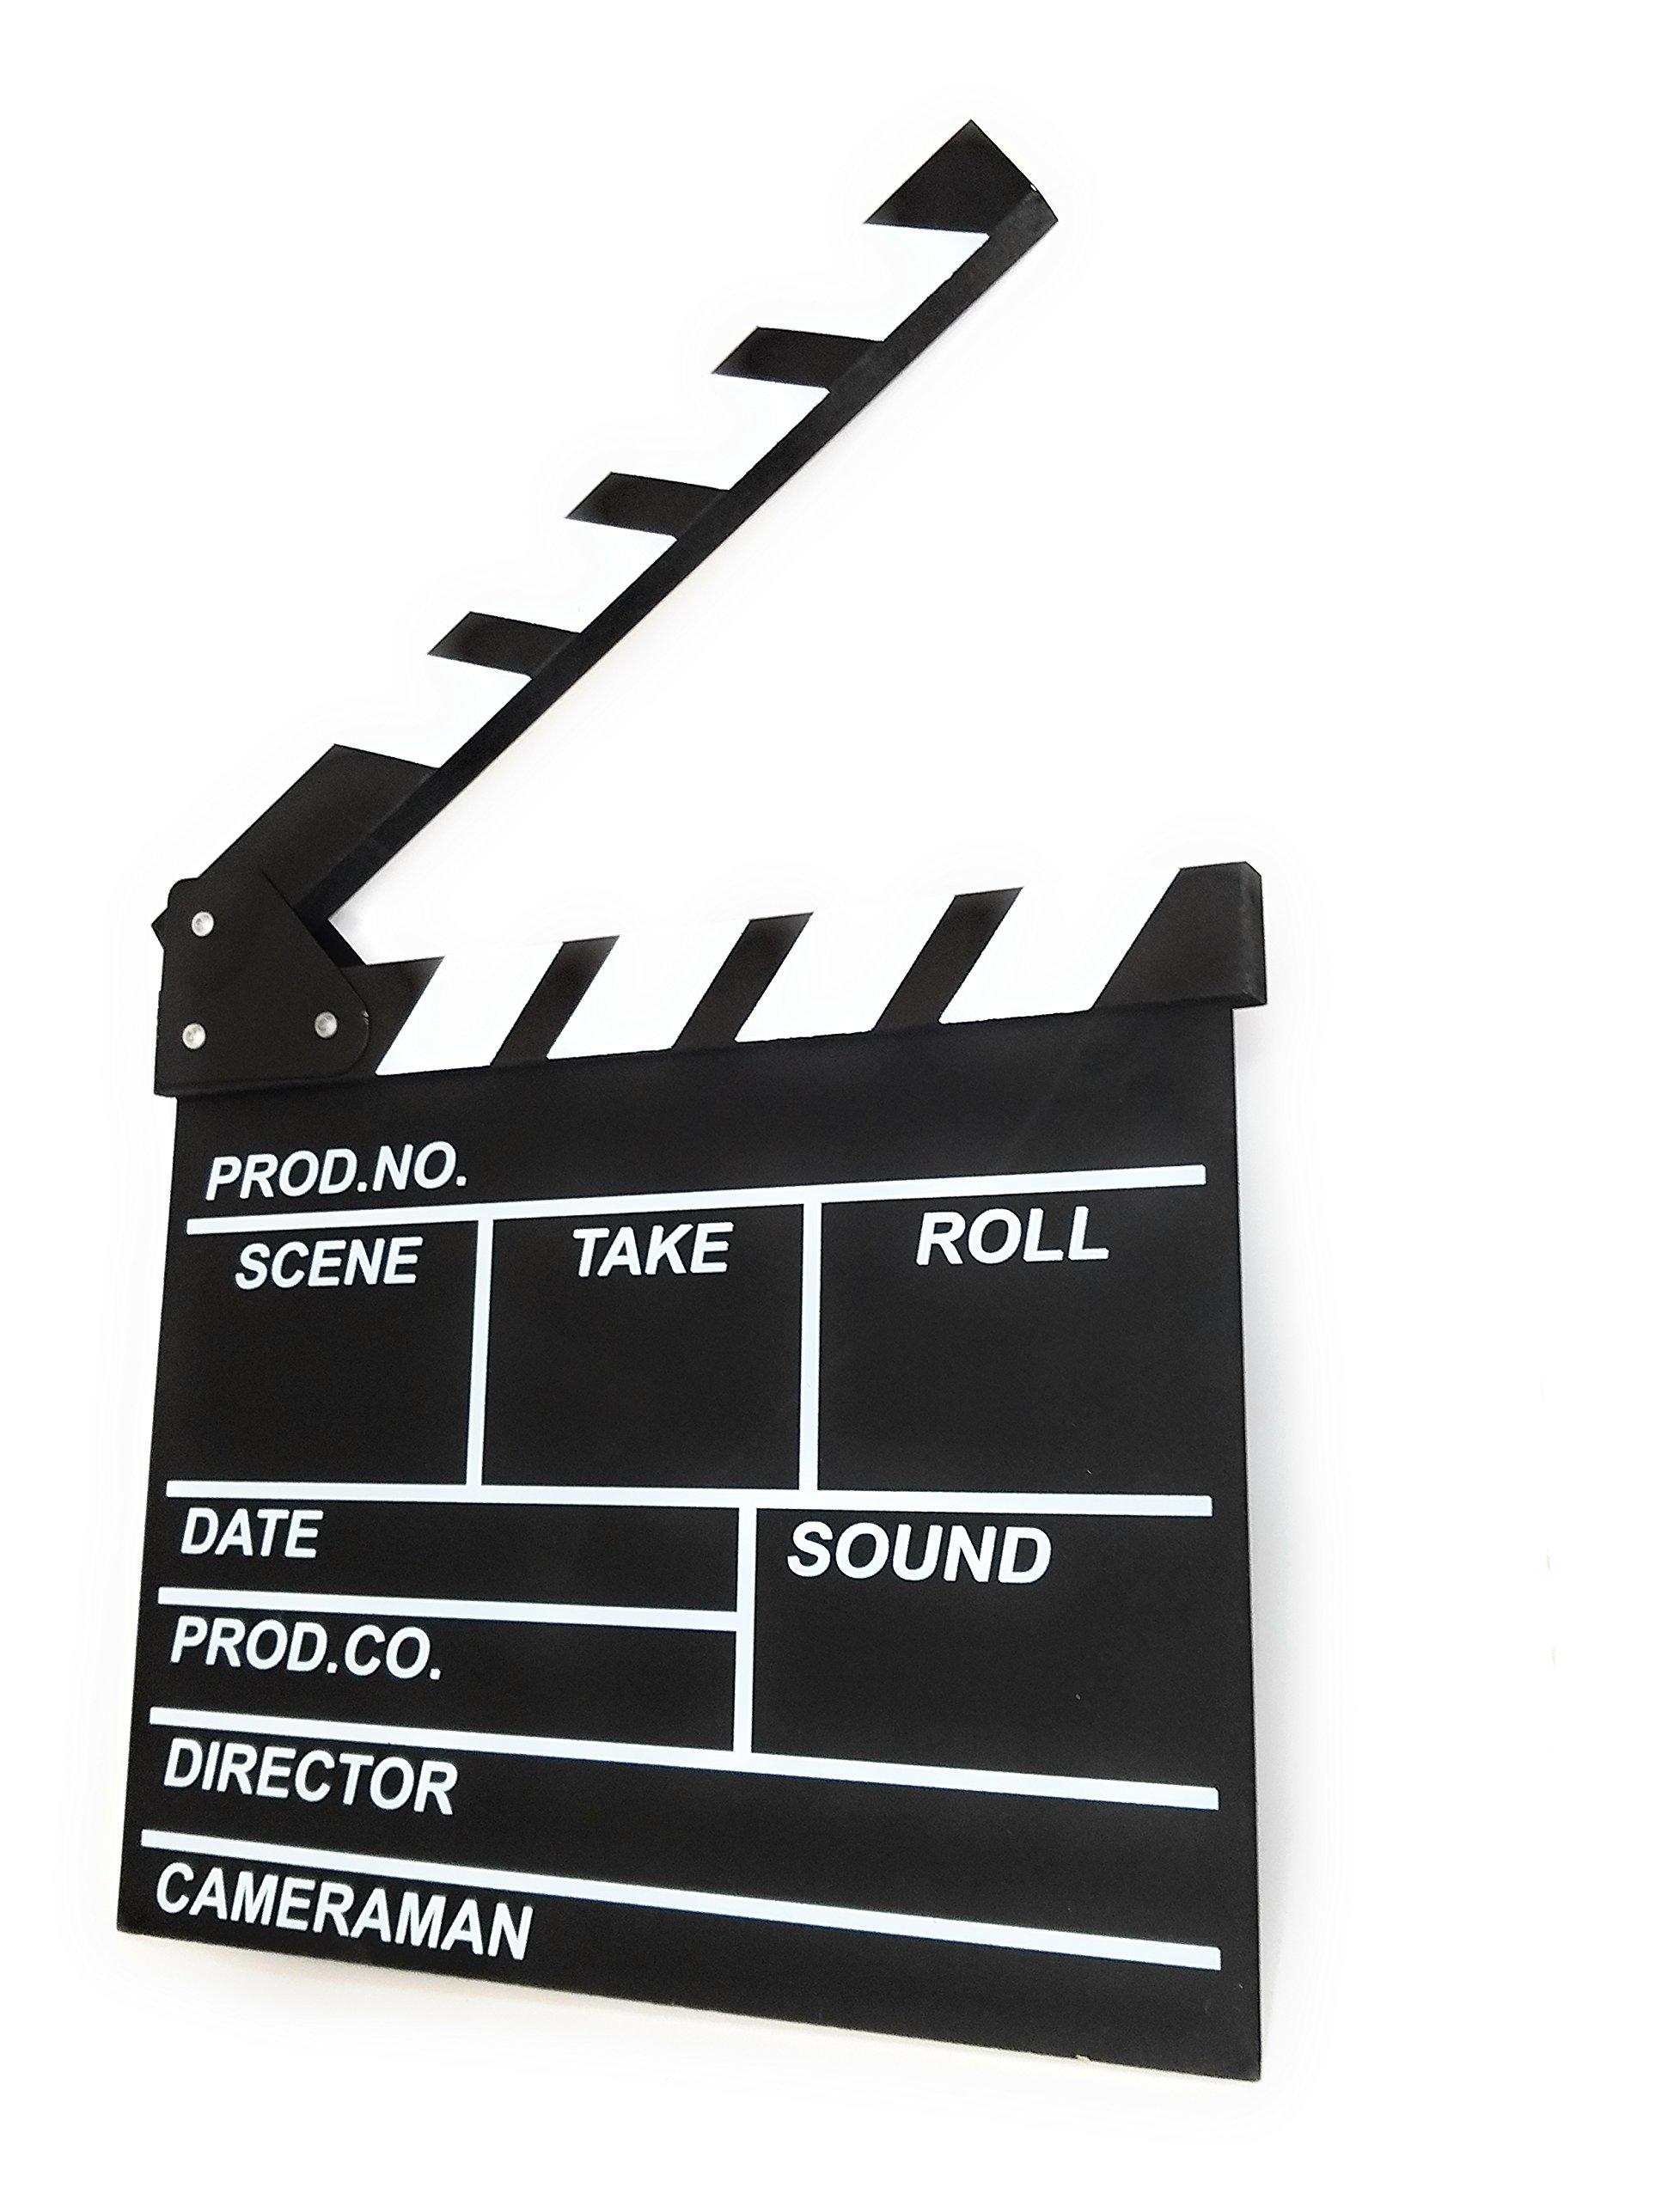 Director's Film Movie Clapper Chalkboard - Professional Vintage Clapper Slate Board - Cut, Action, TV, Movie Clapperboard - (12'' x 11'')